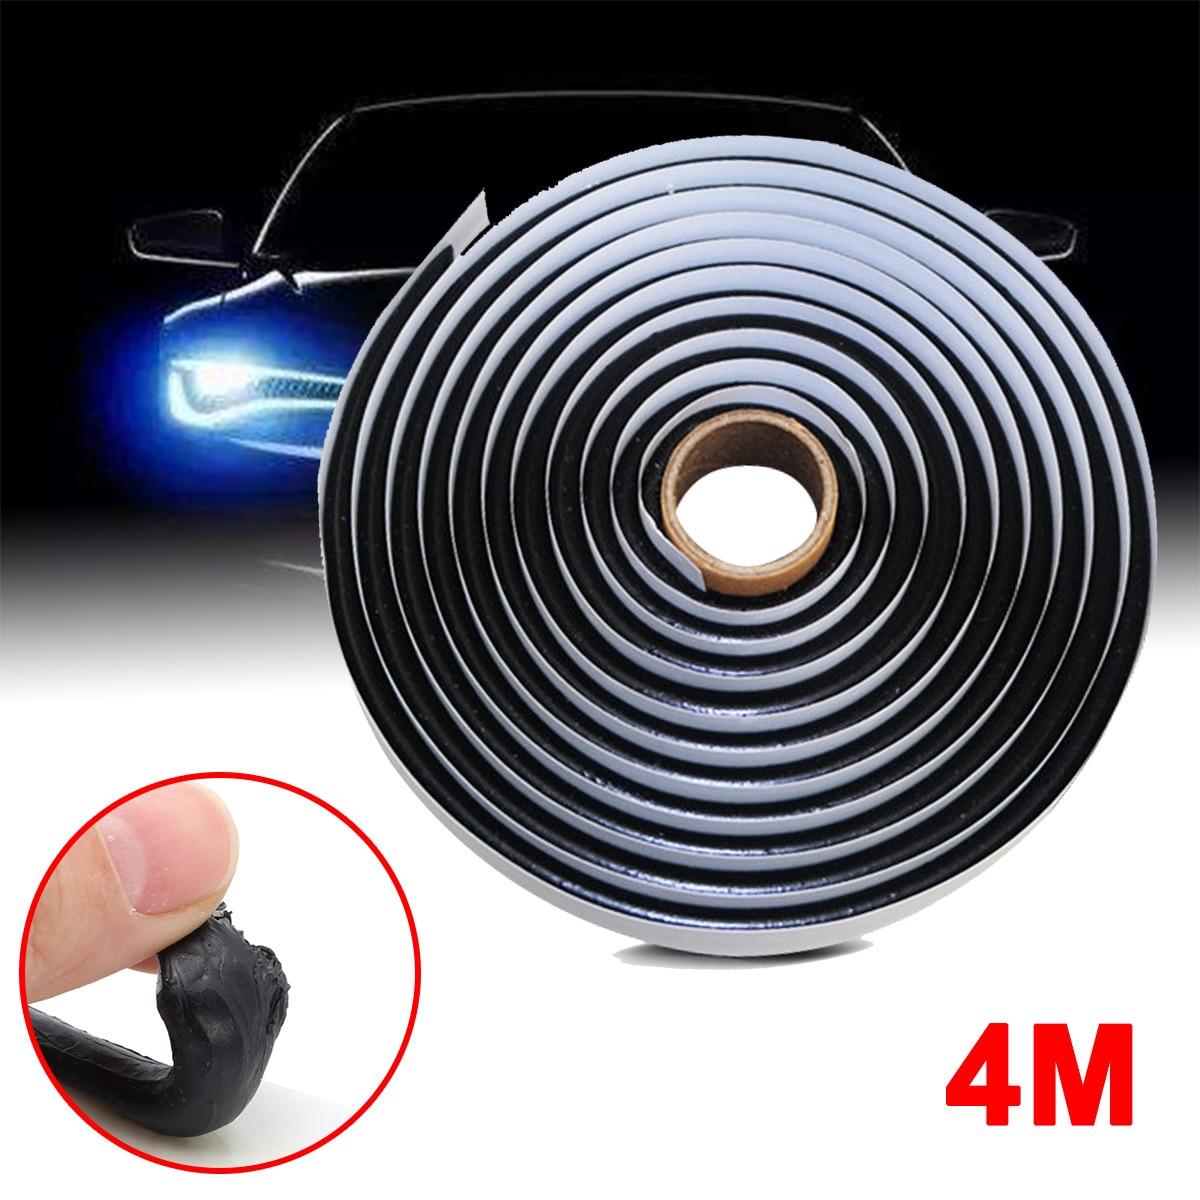 4M Black Butyl Rubber Glue Sealant Car Truck Headlight LED Retrofit Reseal Strip enlarge